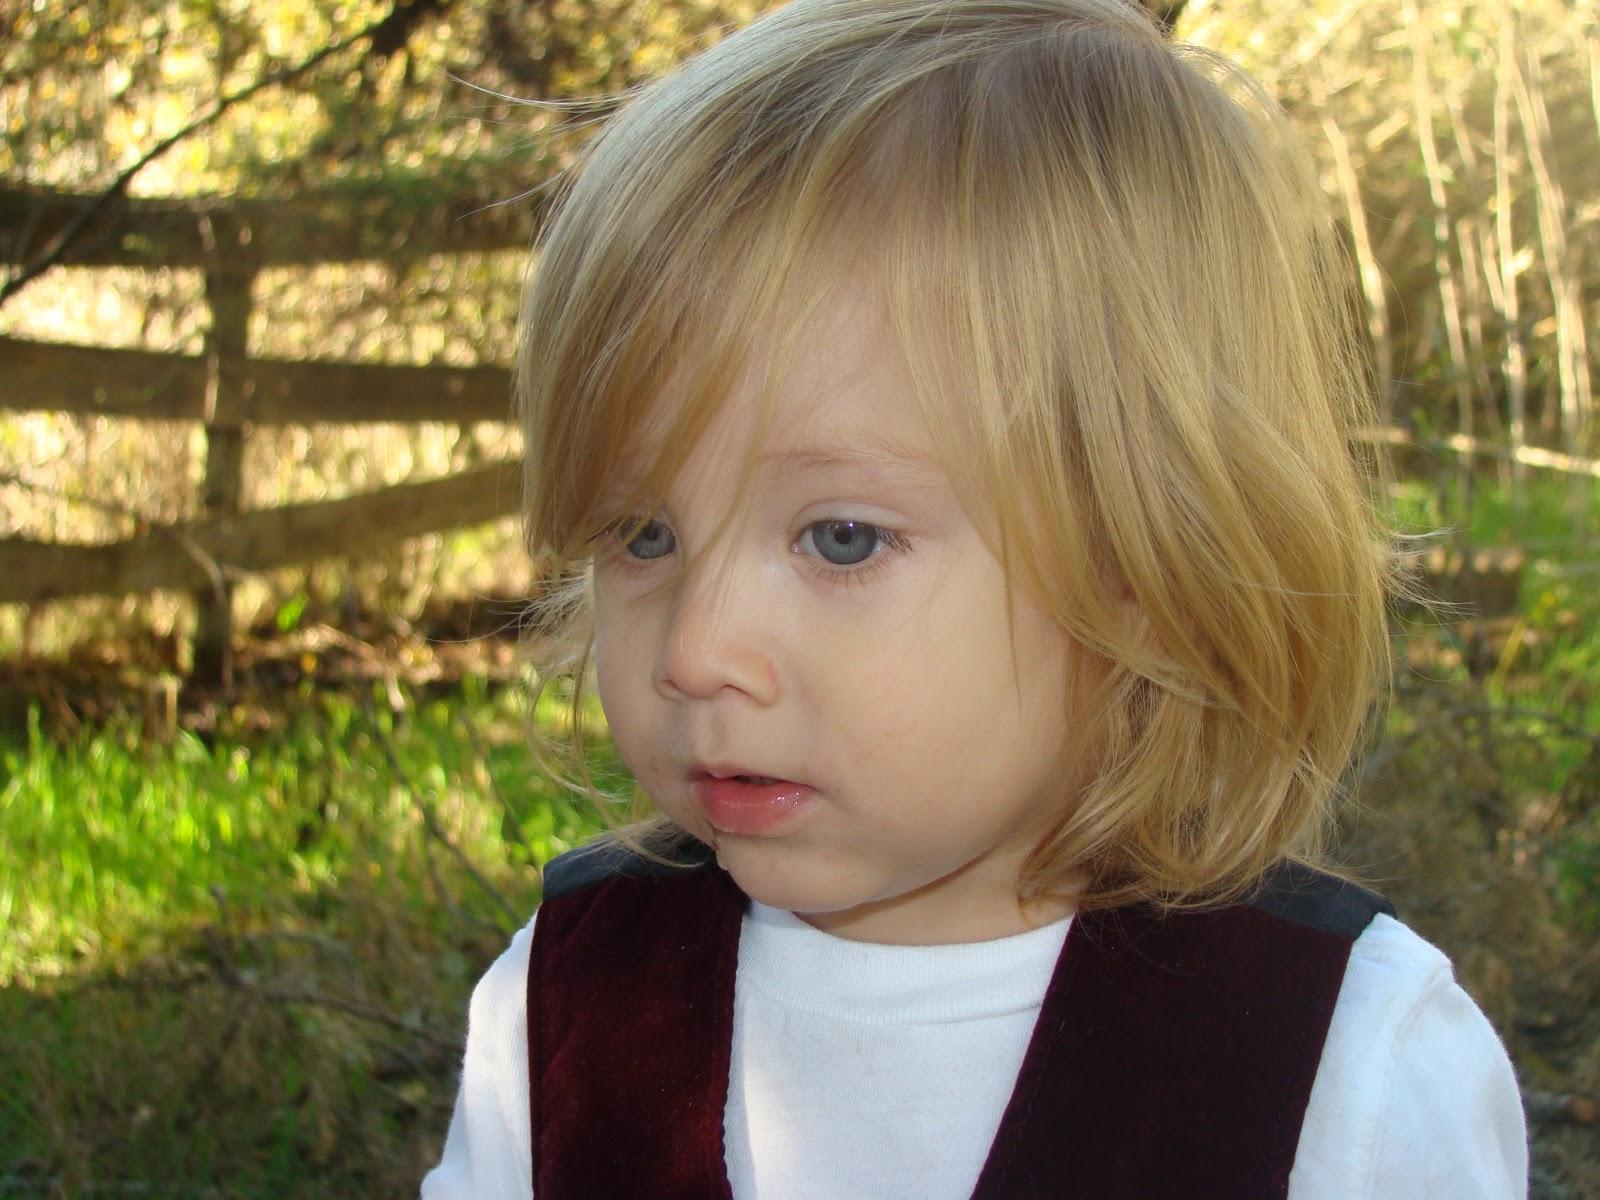 Boy Hairstyles With Long Hair: HAIR INK.: BOYS LONG STRAIGHT HAIR